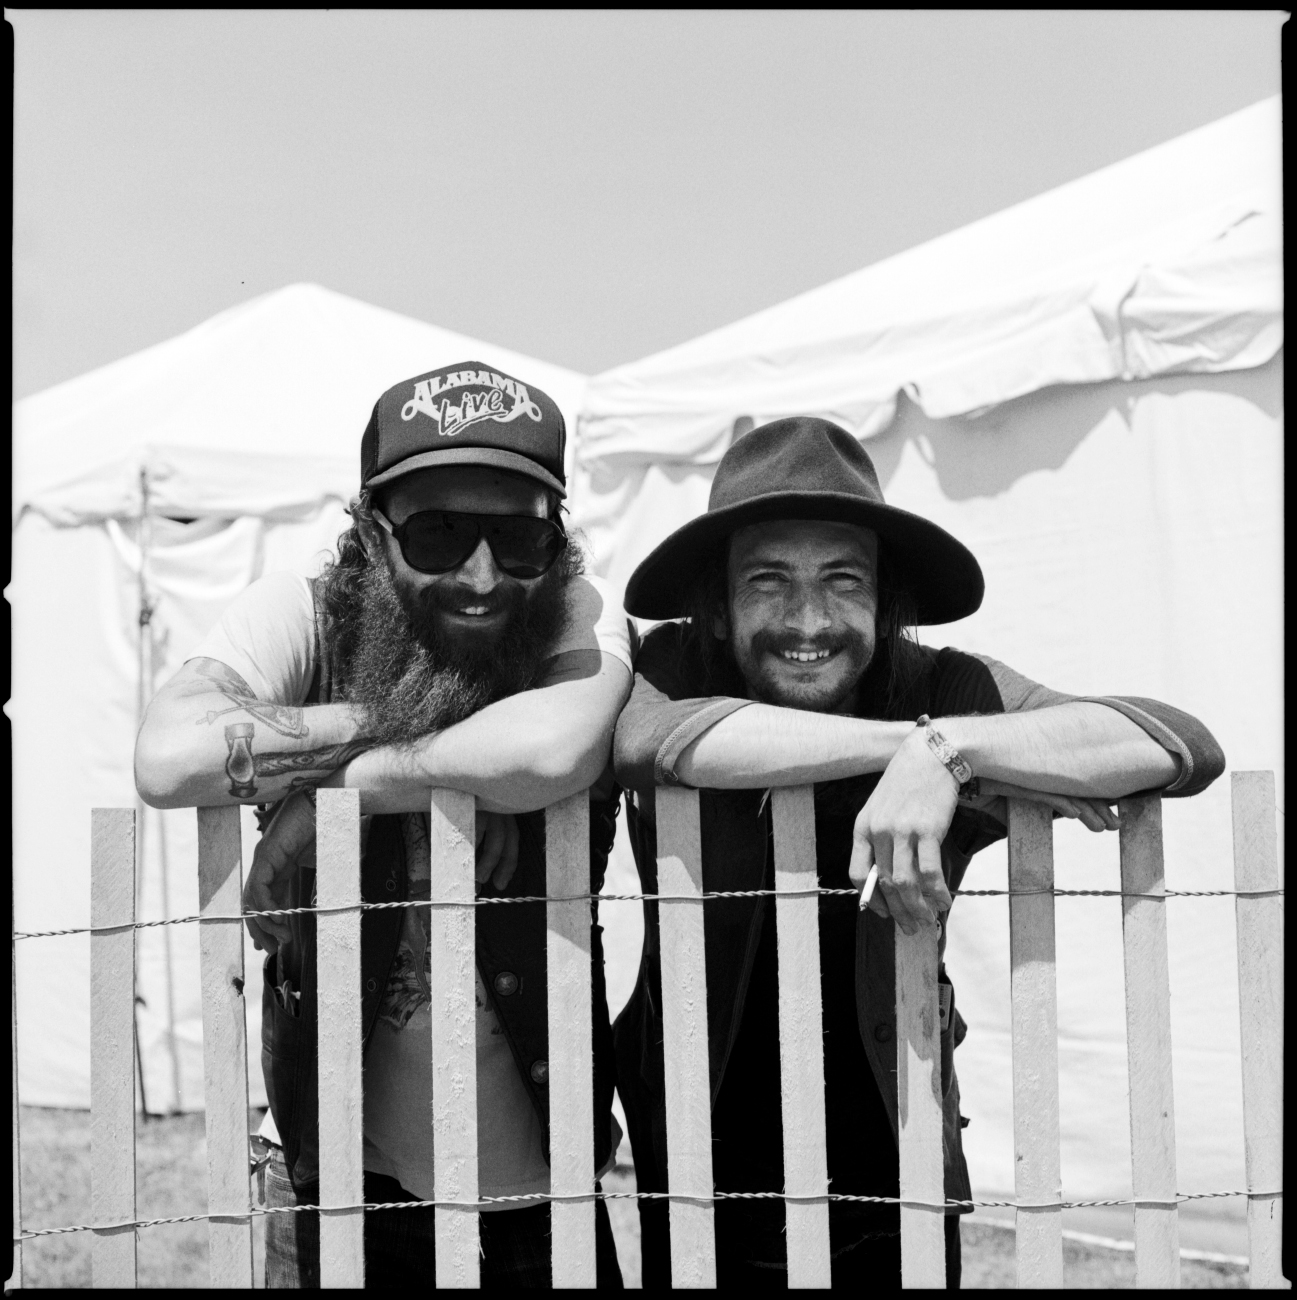 Randy and Steve of Banditos at Newport Folk Fest